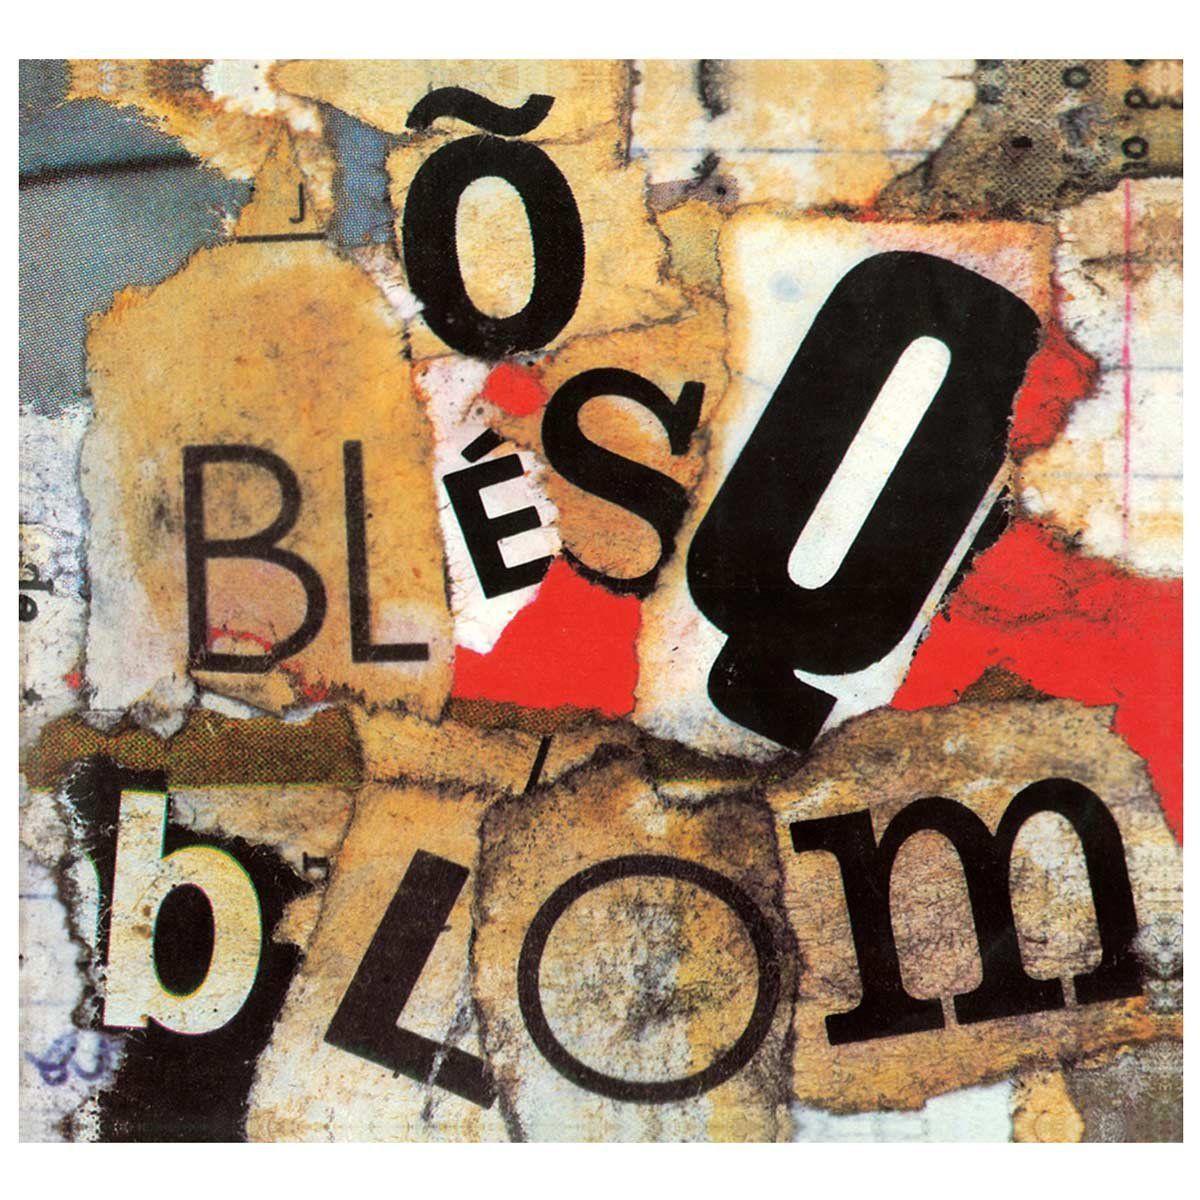 LP Titãs Õ Blesq Blom  - bandUP Store Marketplace